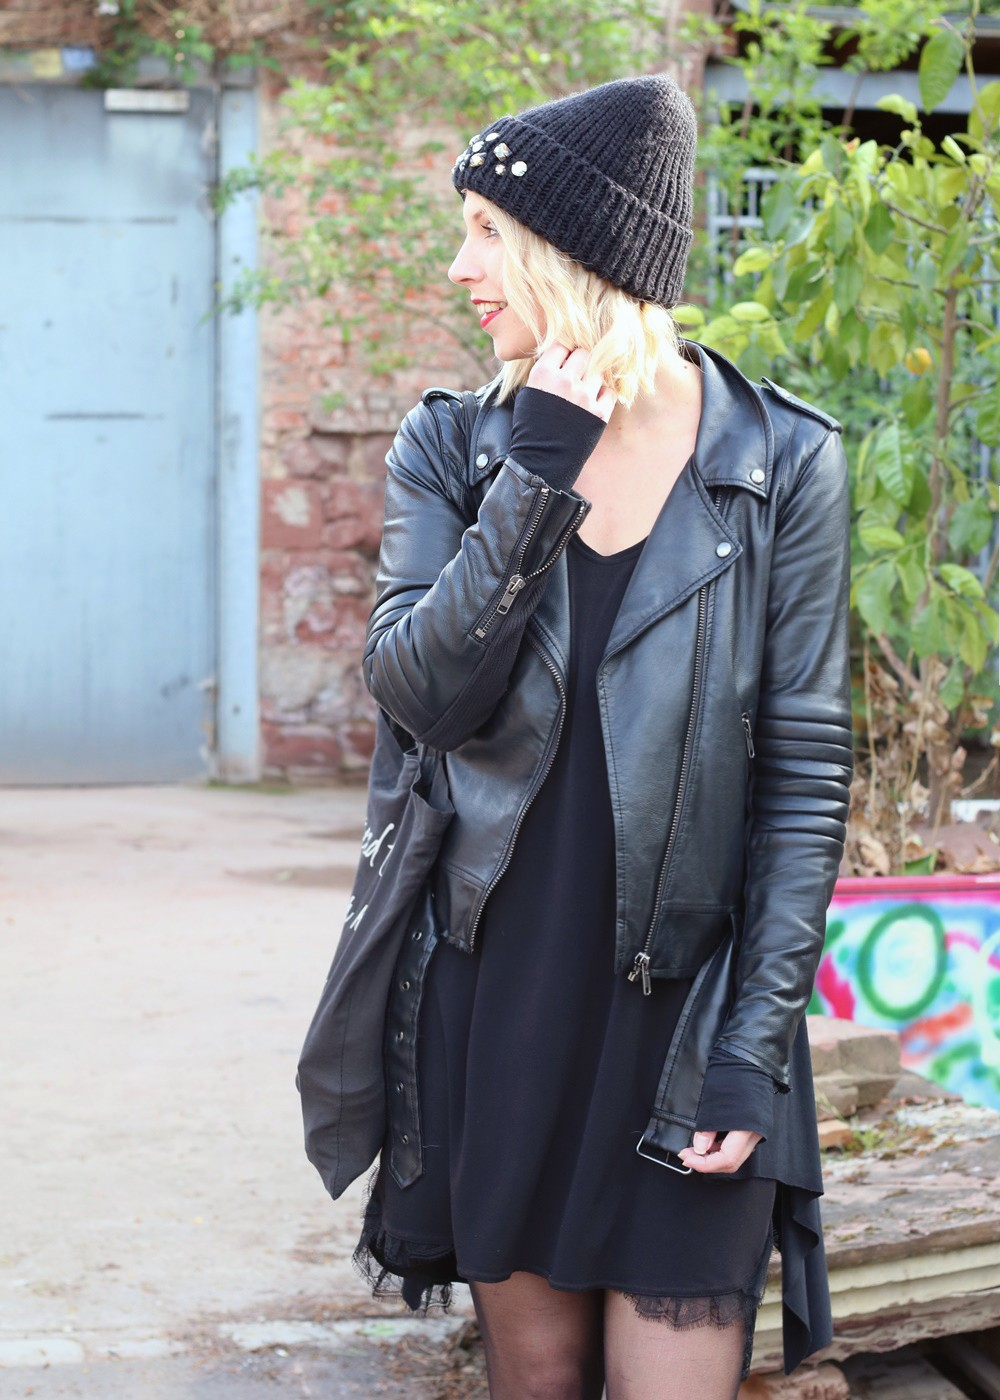 Fashionblogger Karlsruhe Outfit Kleid Lederjacke Bikerboots Beanie all in black (4)